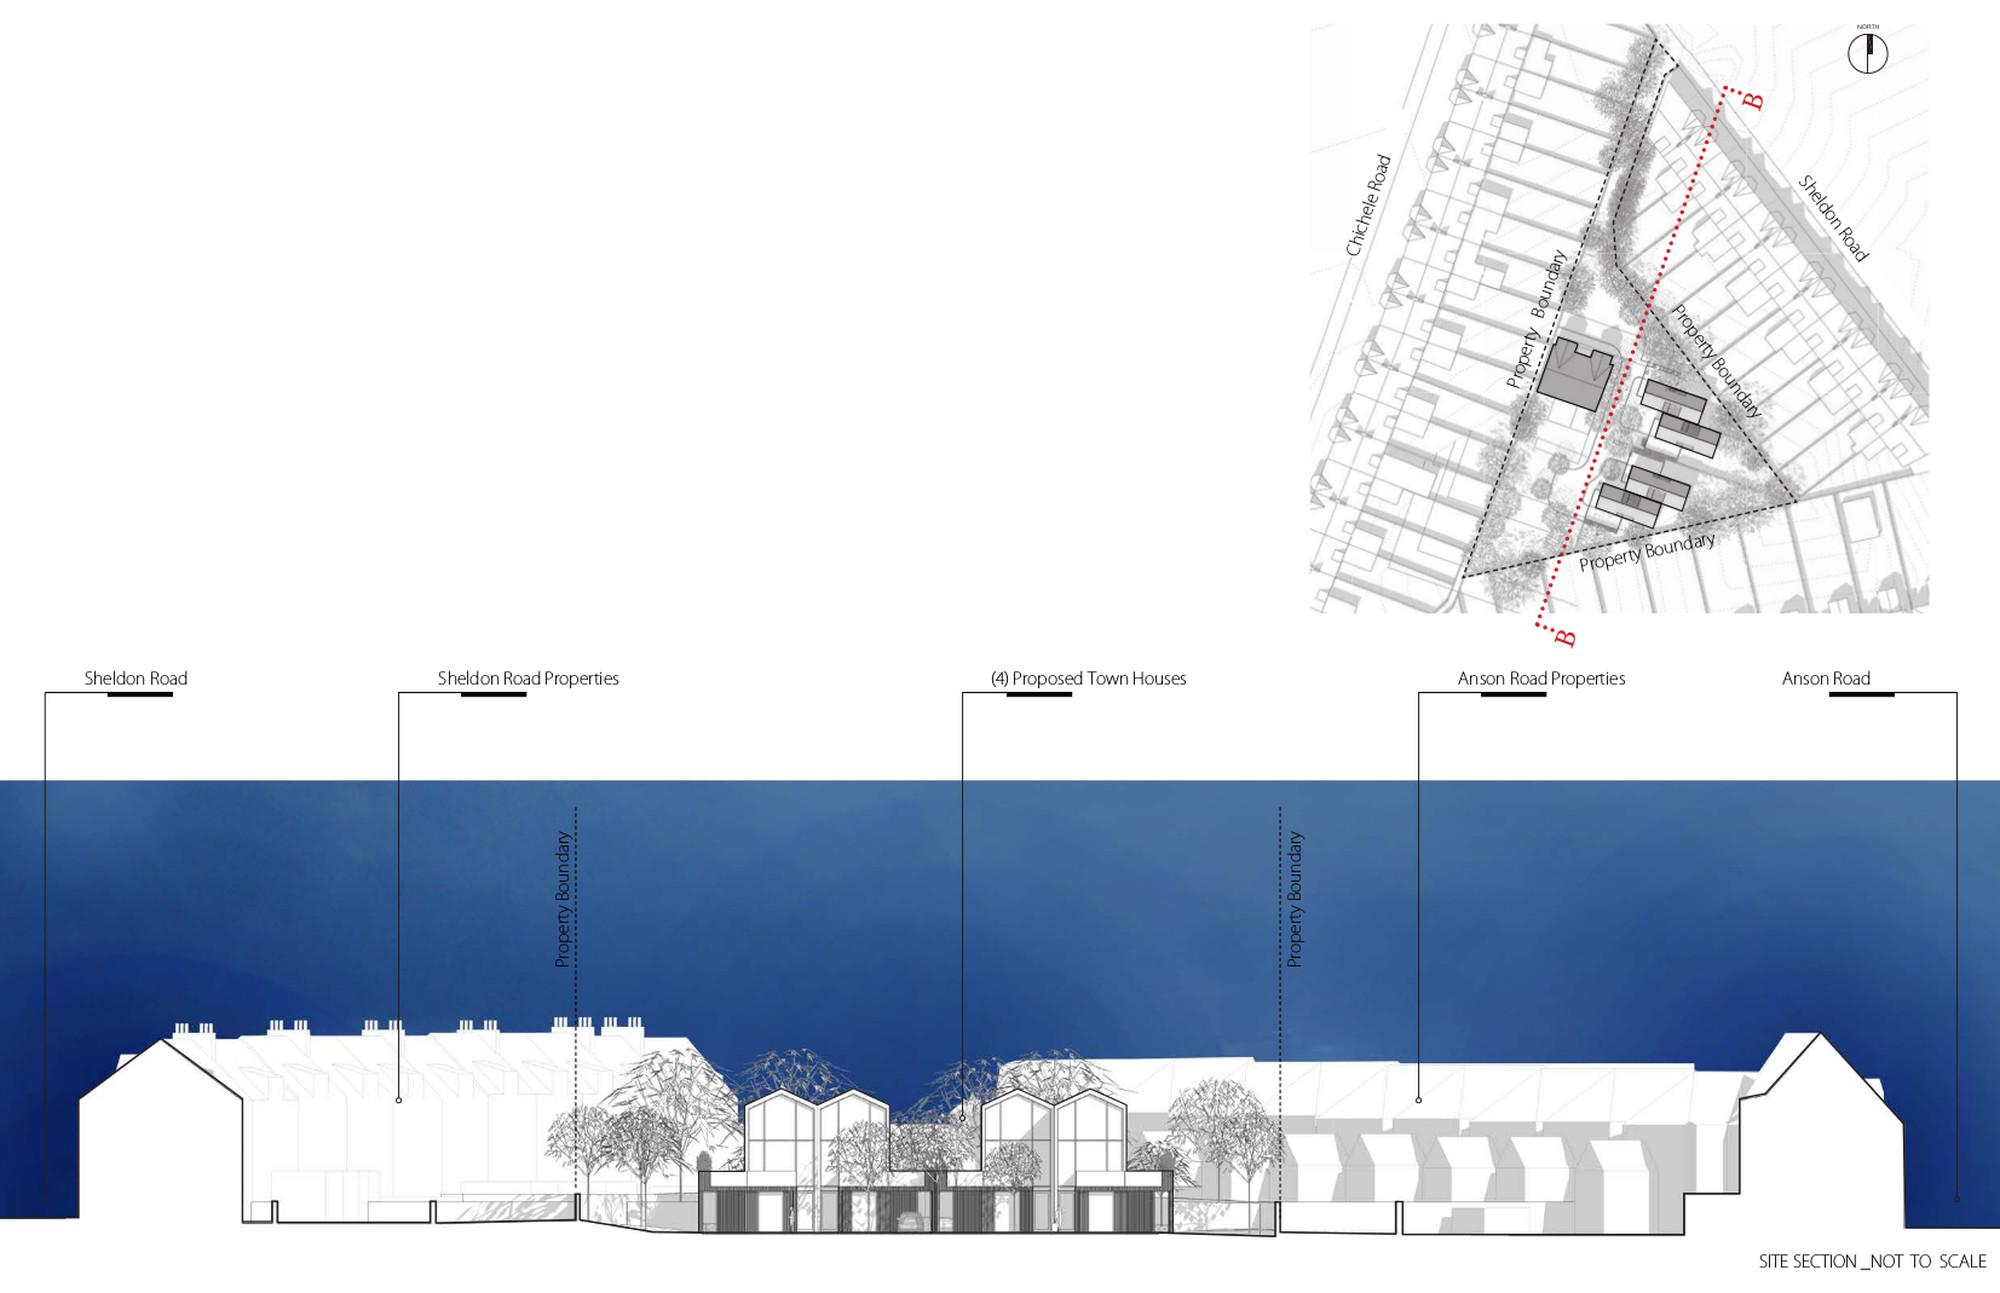 Sheldon Lodge Development Site Section